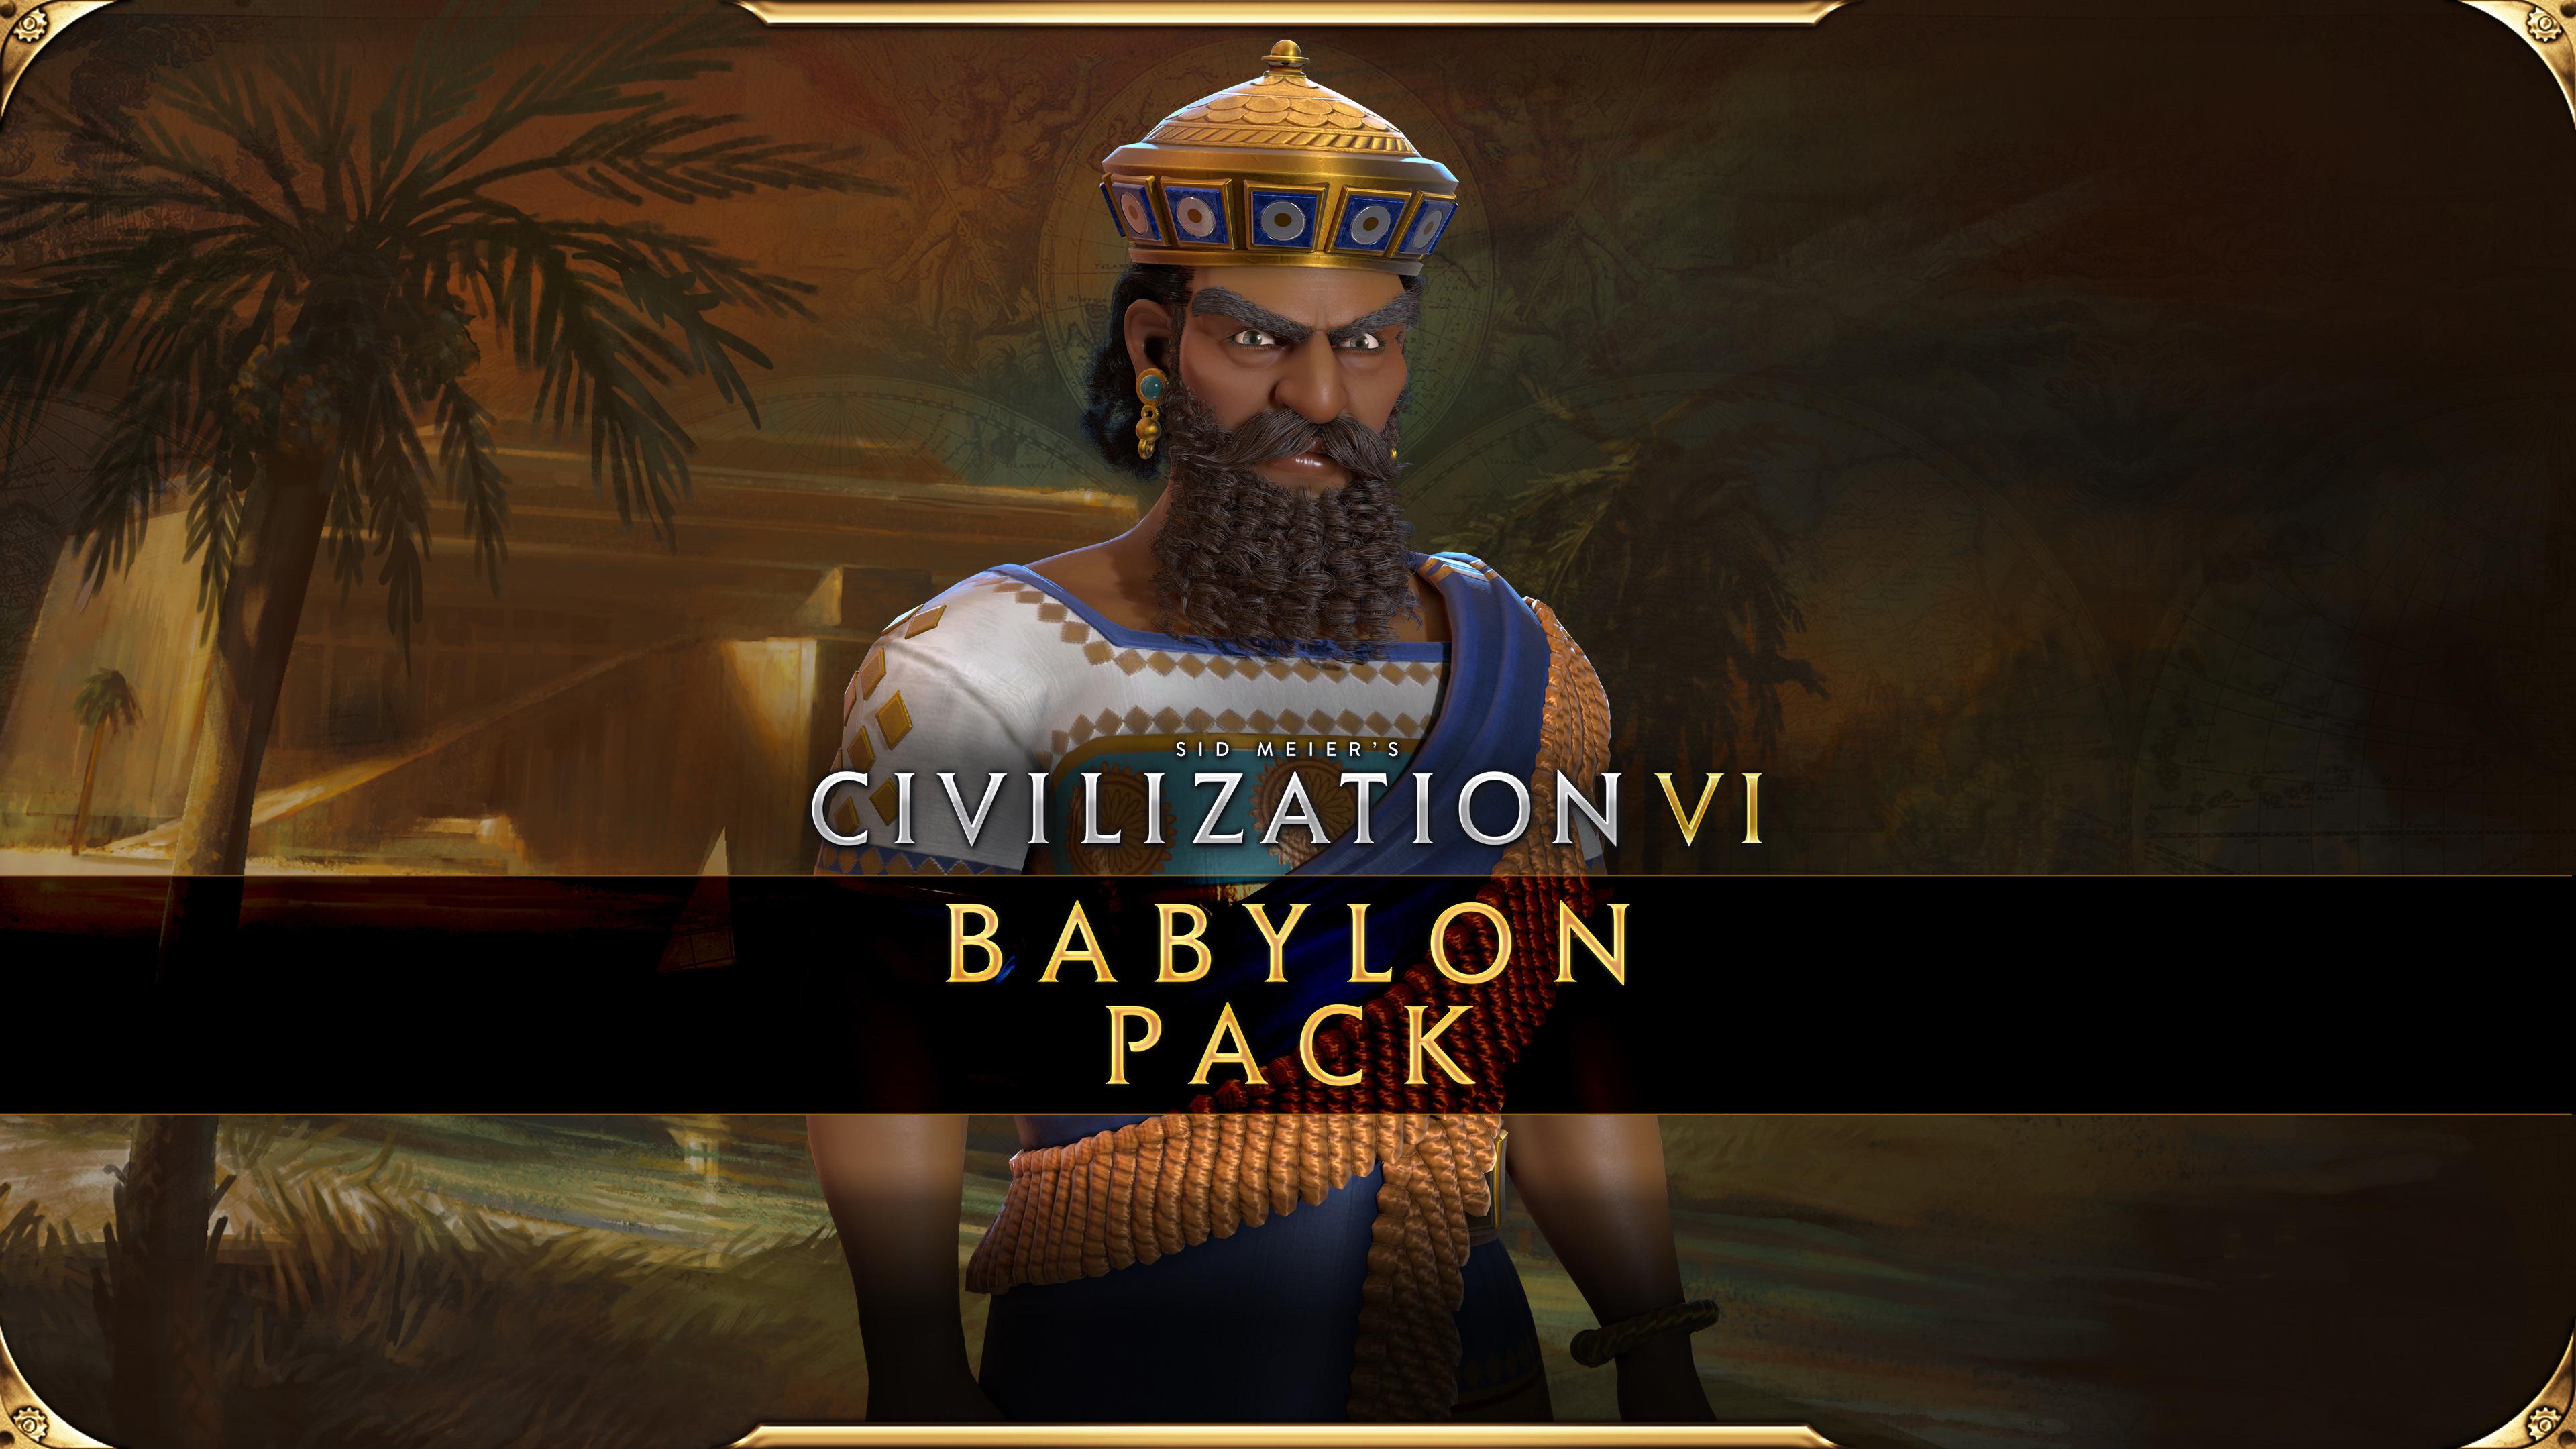 Civilization VI - Babylon Pack Available Now